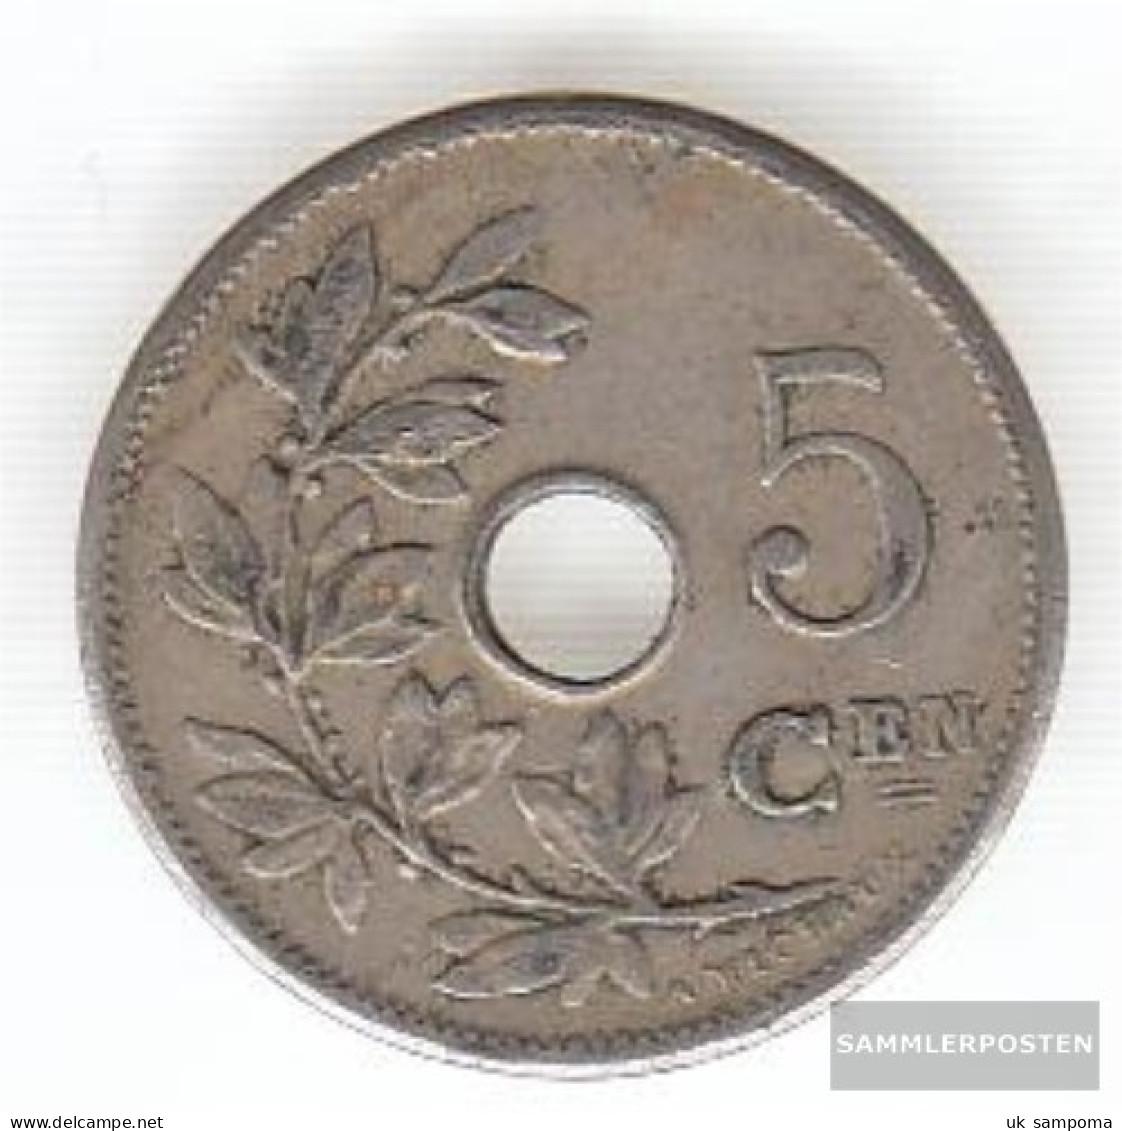 Belgium Km-number. : 55 1906 Very Fine Copper-Nickel Very Fine 1906 5 Centimes Gekröntes Monogram - 03. 5 Centimes